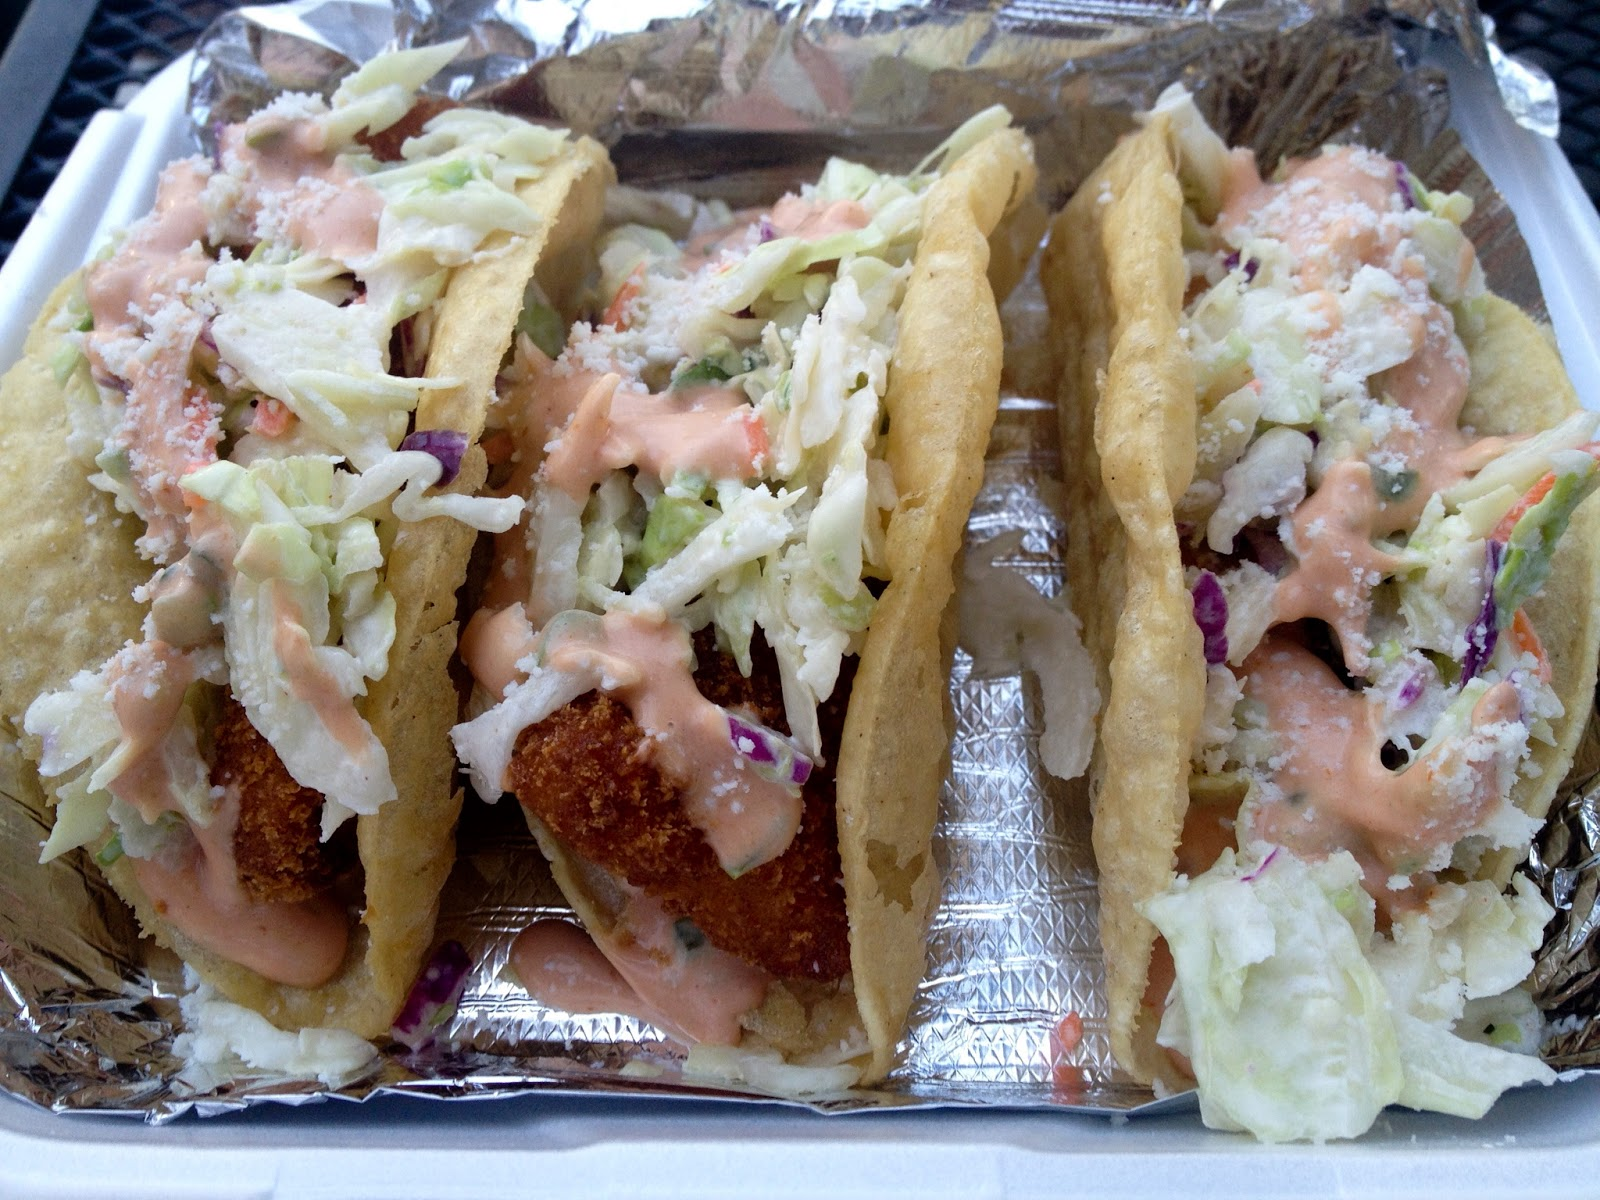 food blog, food blogger, food in utah, food truck, roccos, roccos tacos, roccos tacos and wings, fish tacos, utah food truck, utah food, places to eat in provo,